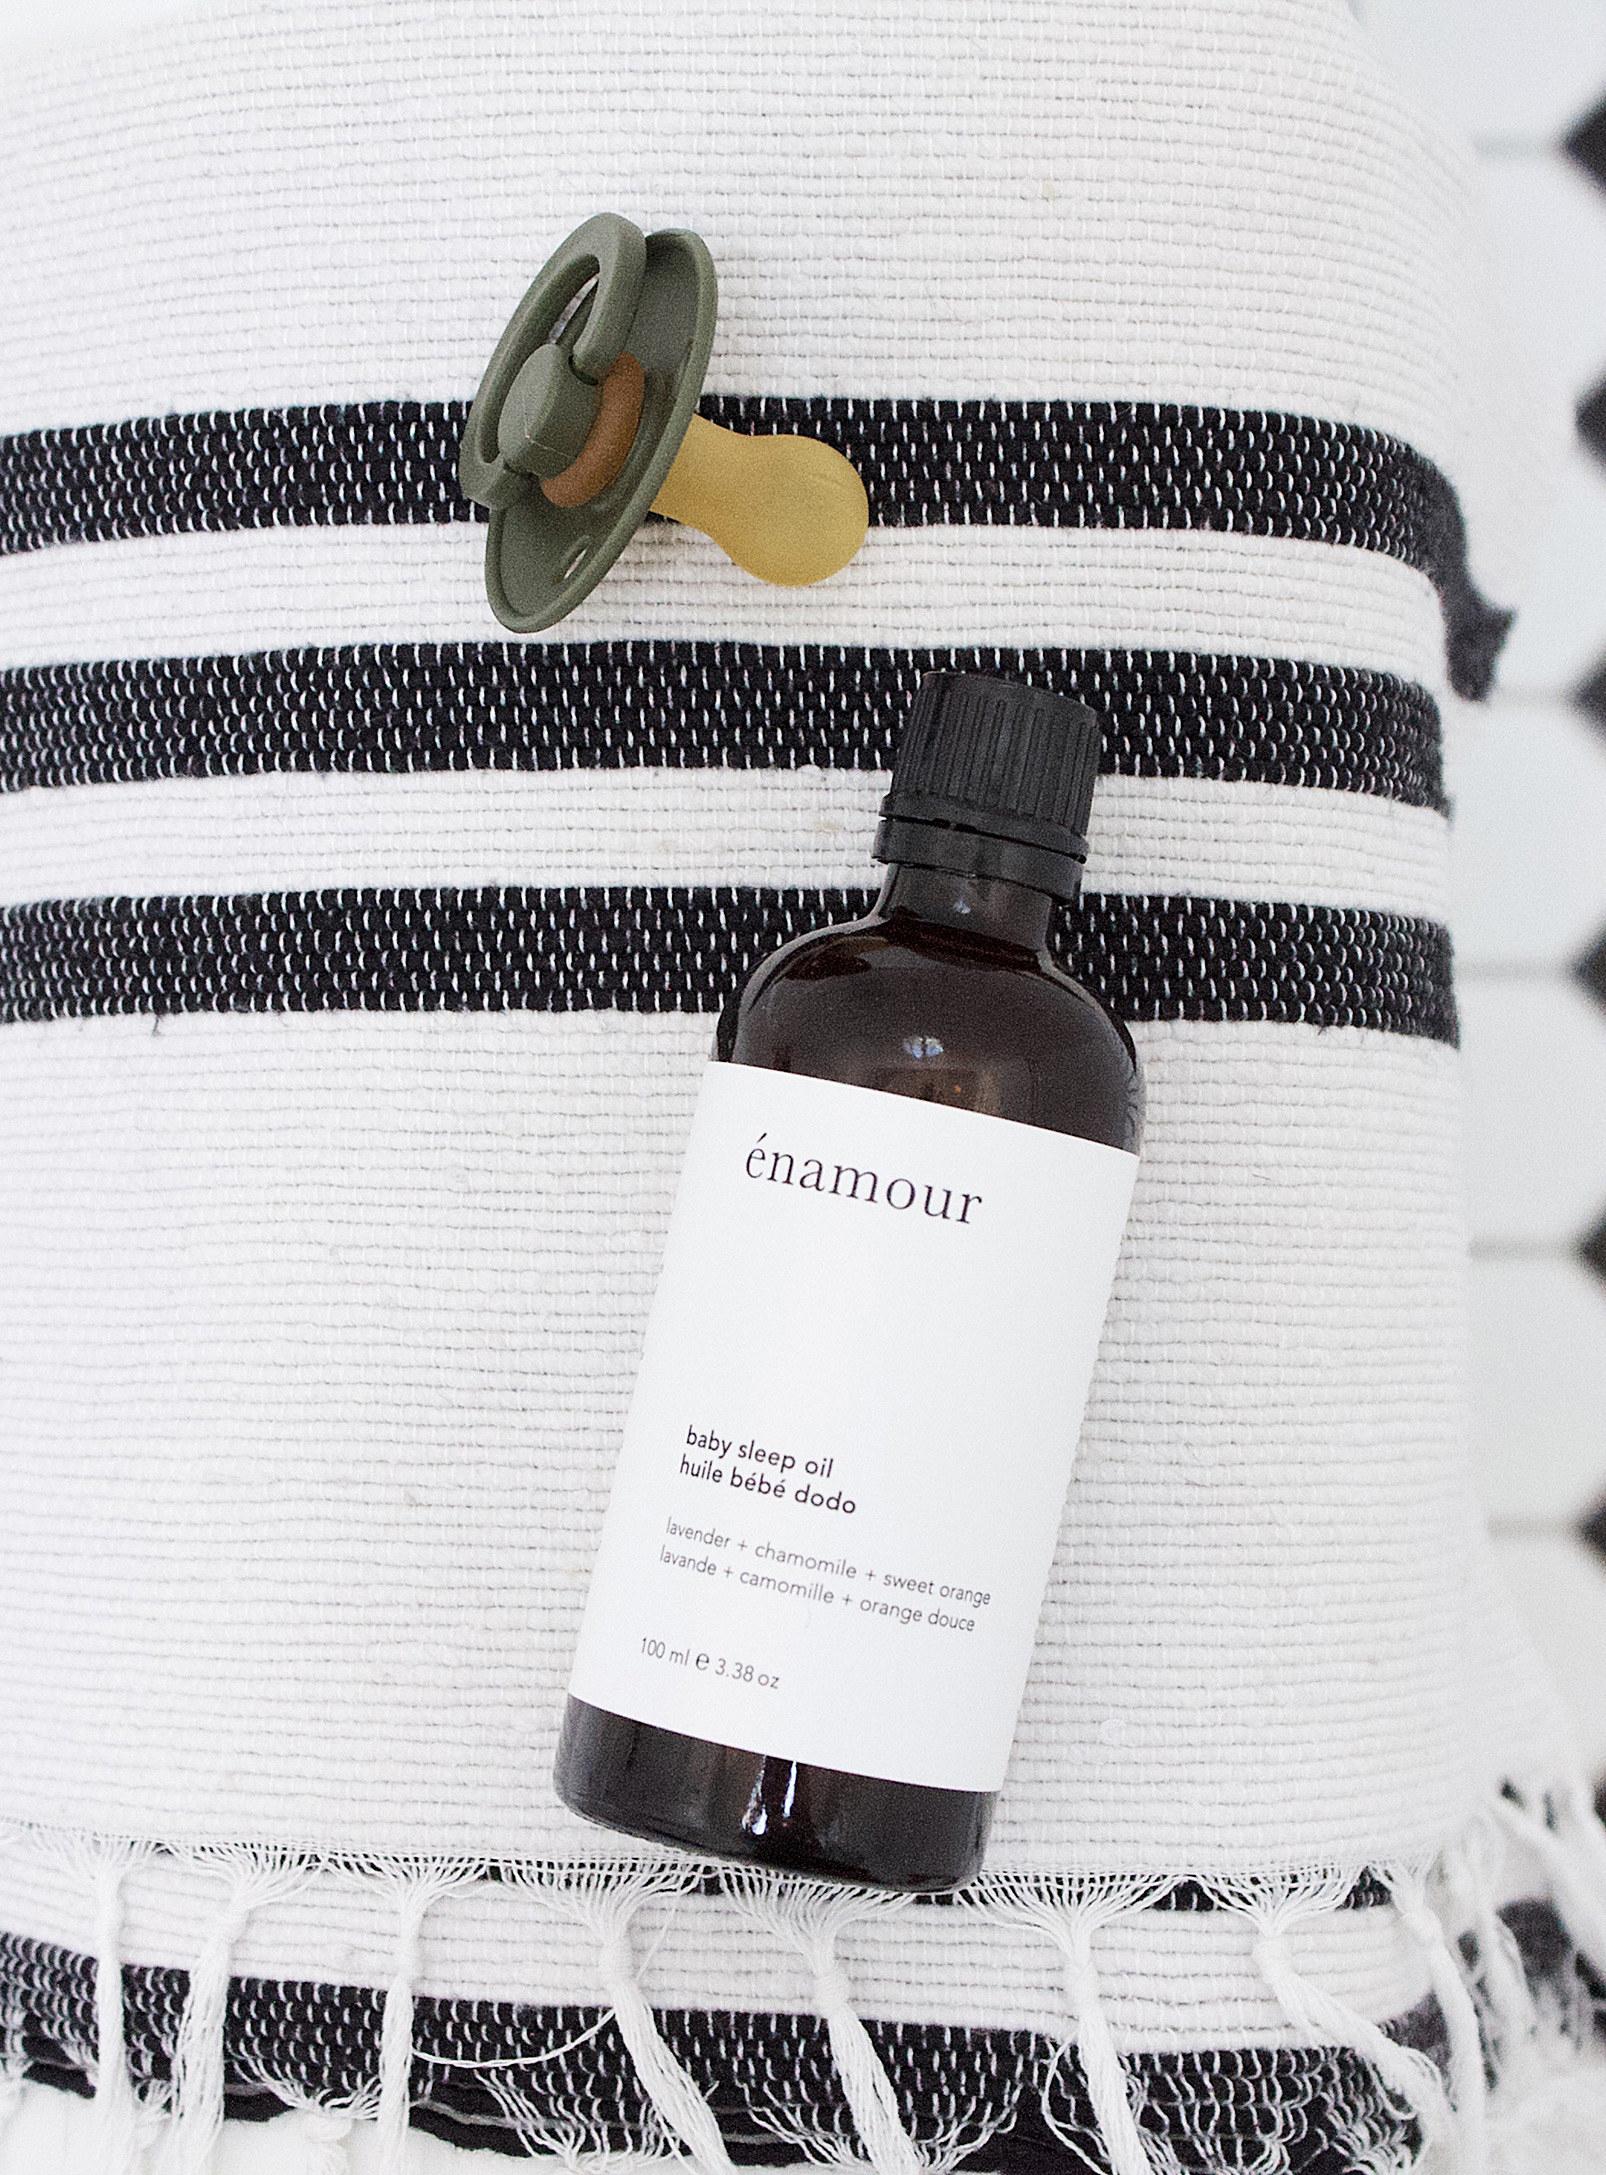 A bottle of sleep oil on a blanket